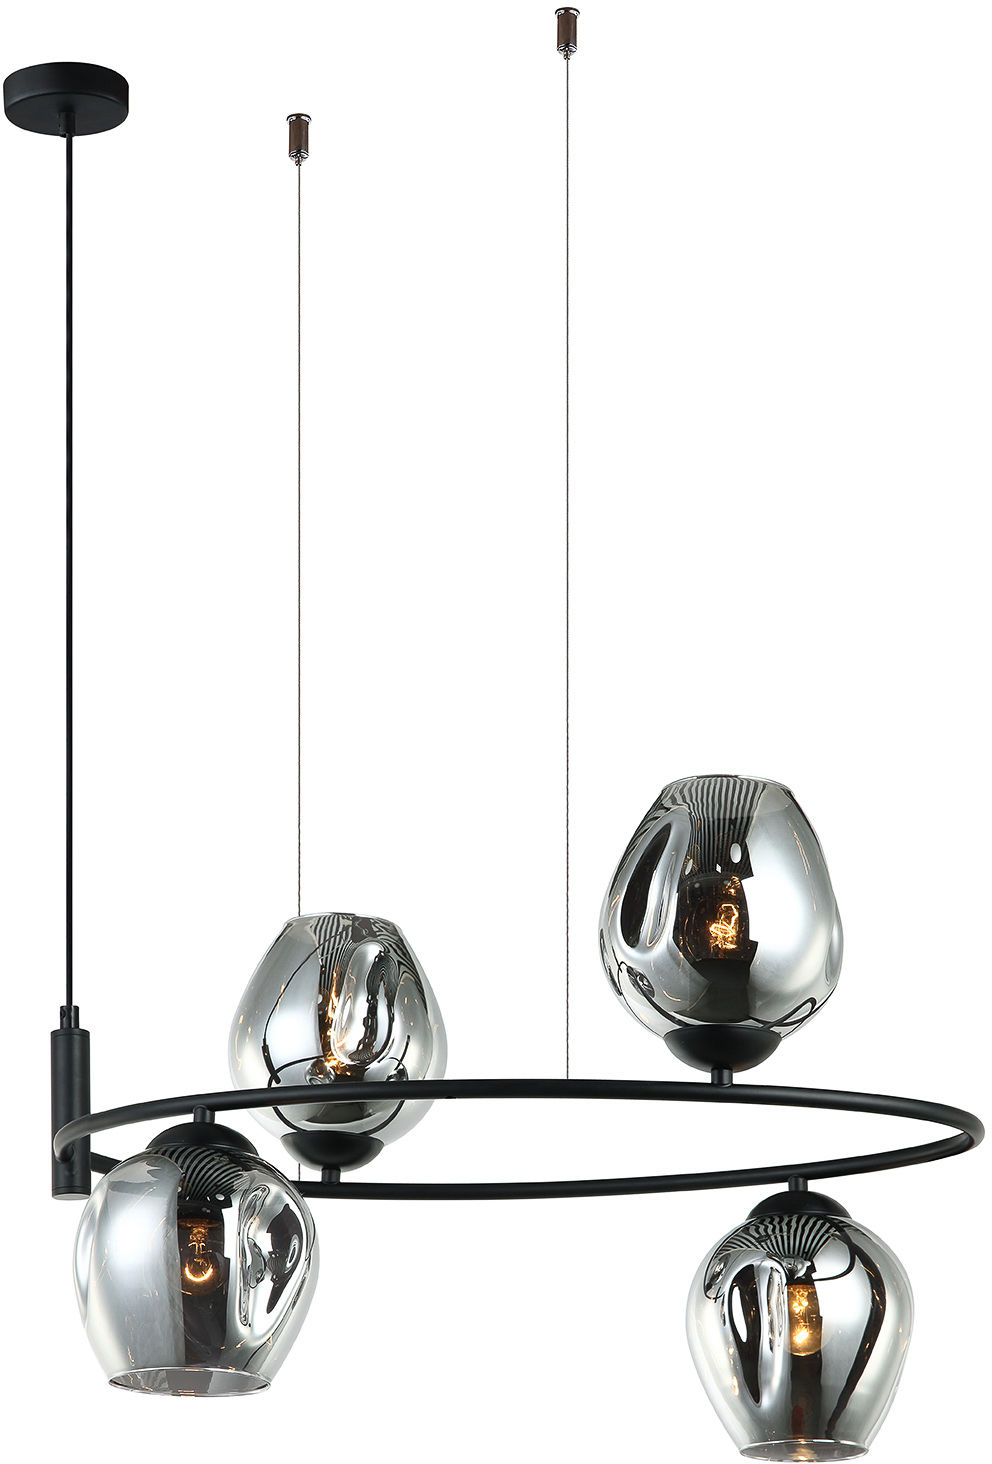 Italux lampa wisząca Roxane MDM-4046-4 BK+SG czarna szklane grafitowe klosze 60cm